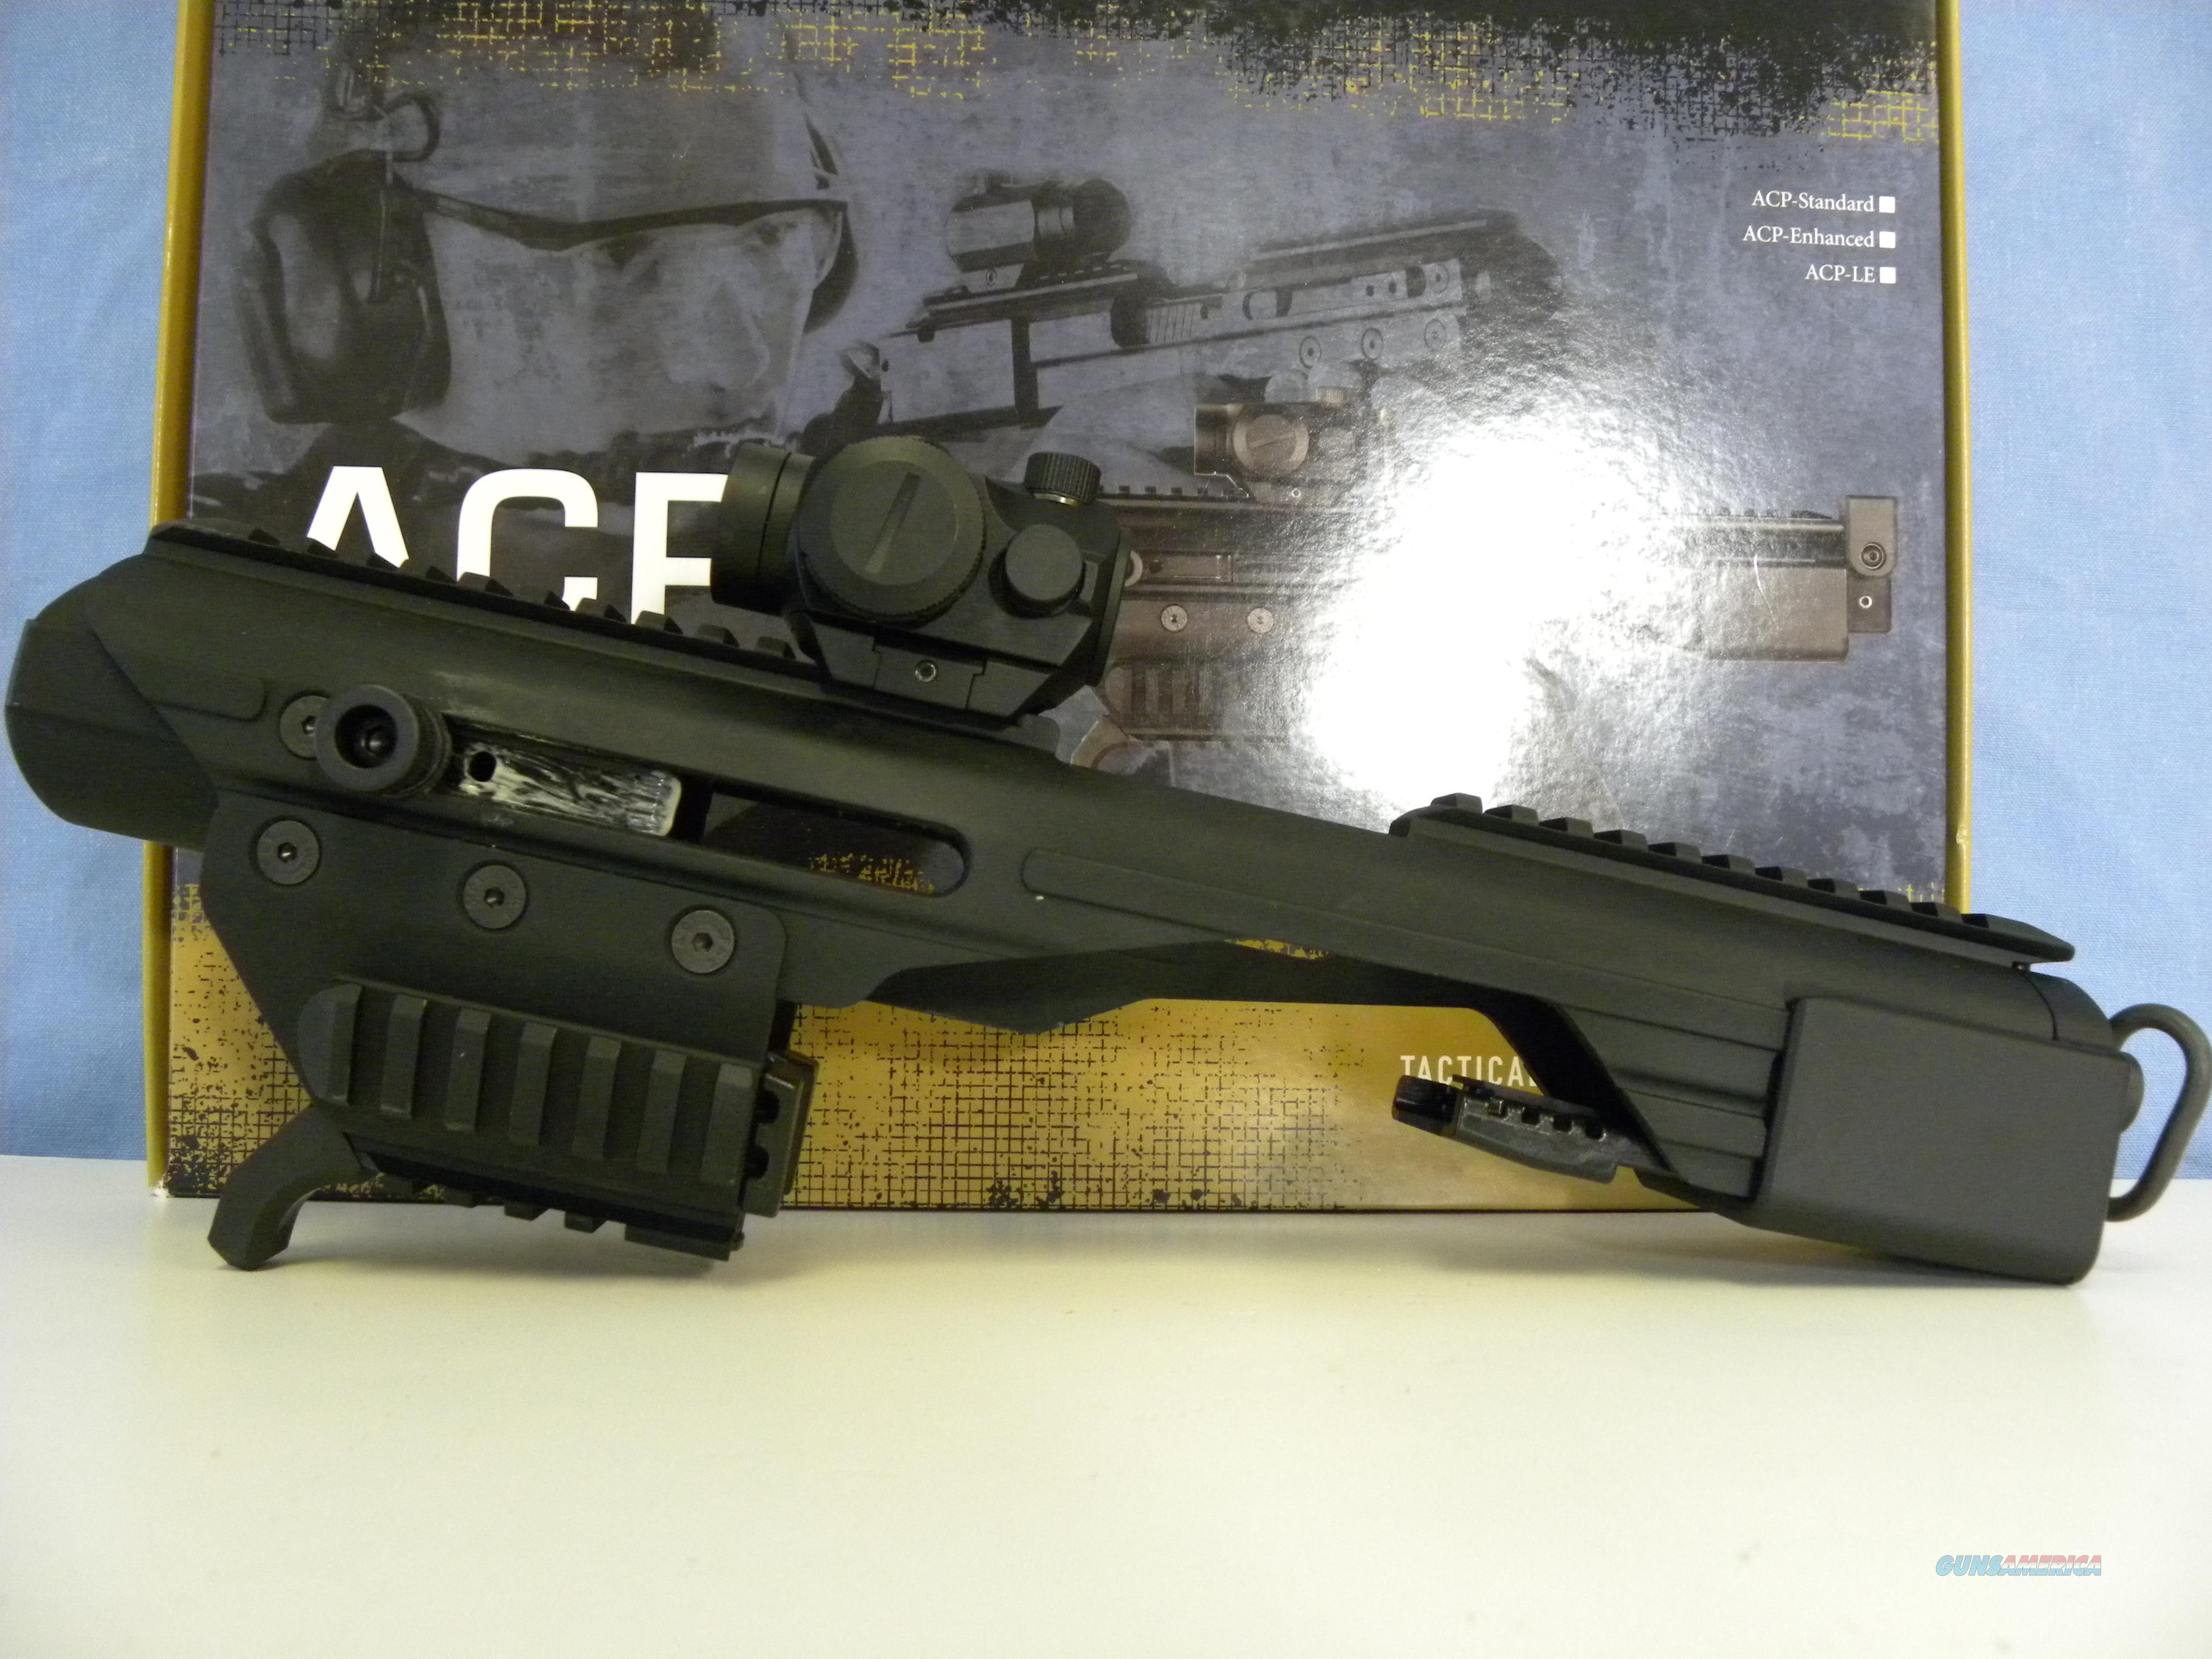 Itac Adaptive Carbine Platform w/ Red Dot  Non-Guns > Gunstocks, Grips & Wood